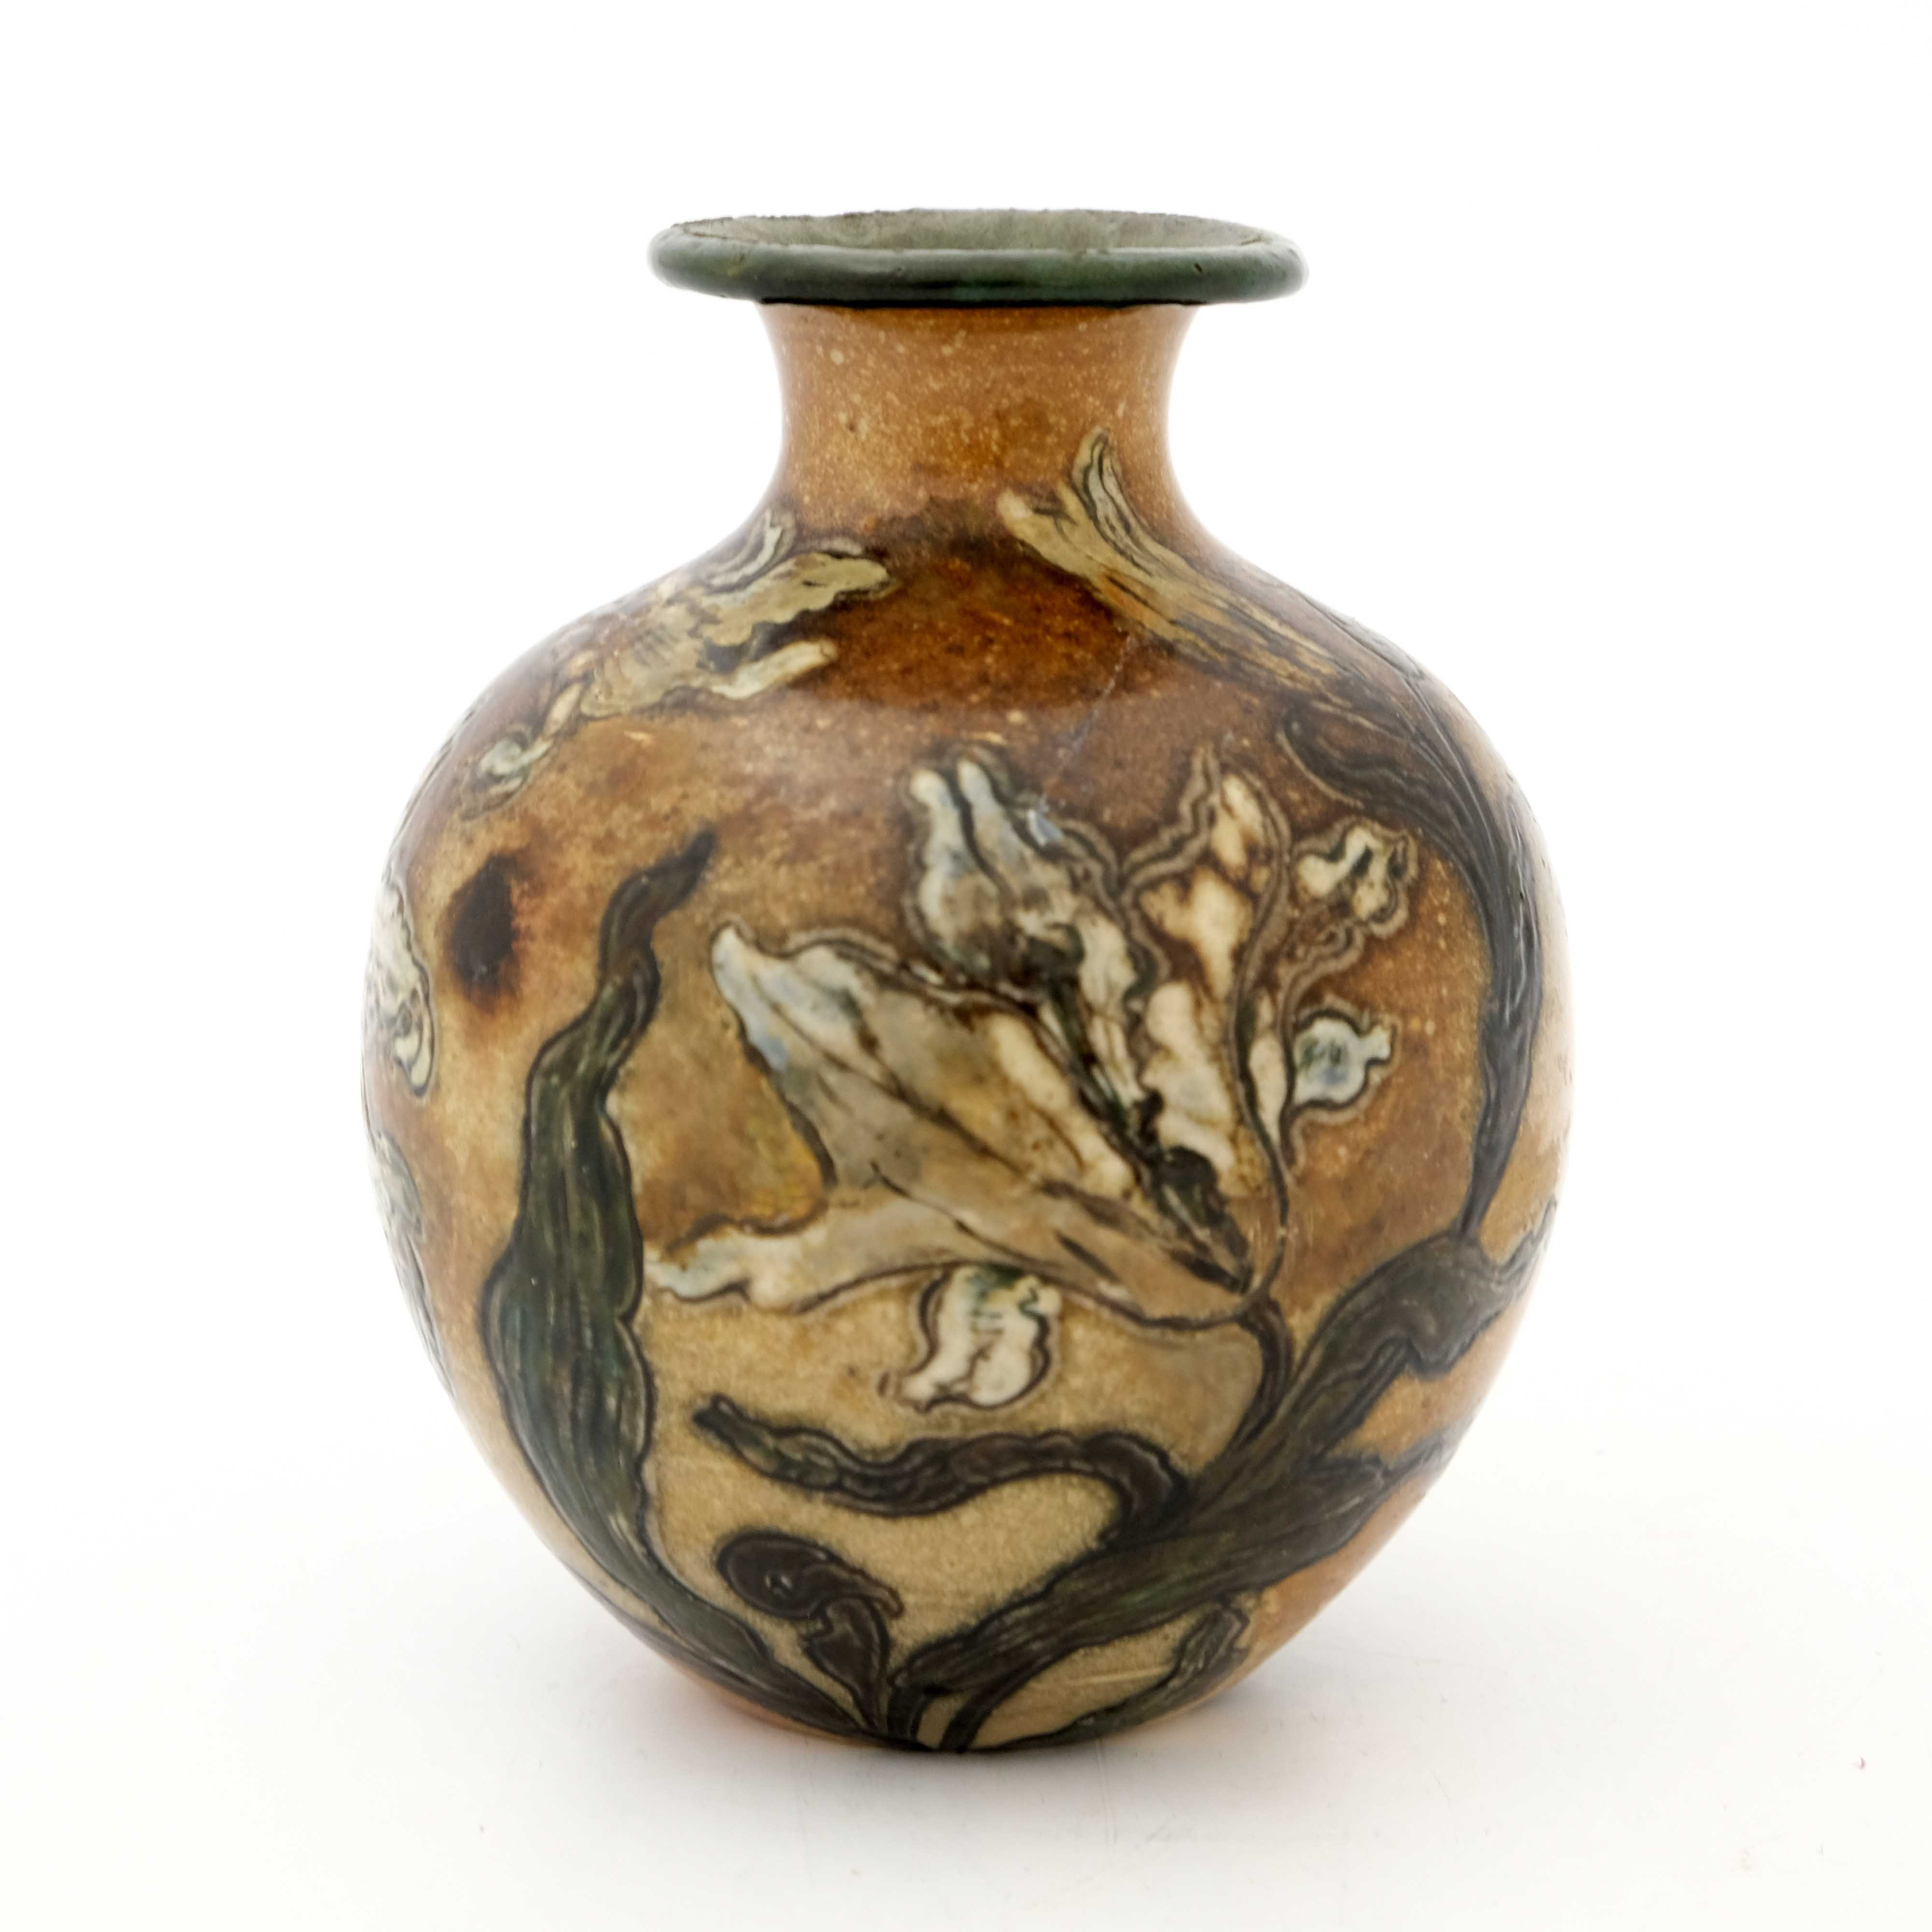 Edwin Martin for Martin Brothers, a stoneware vase